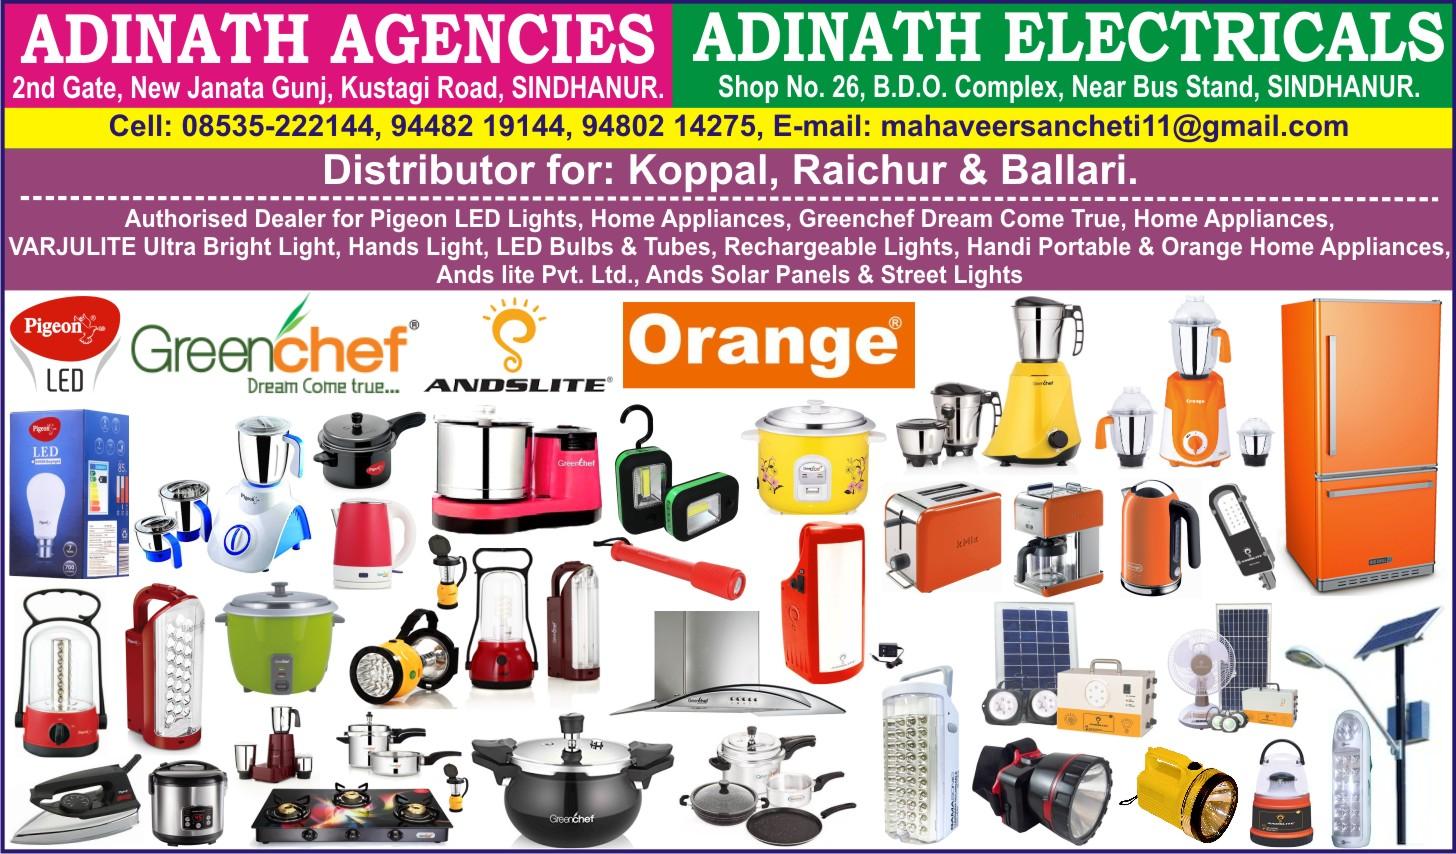 ADINATH ELECTRICALS